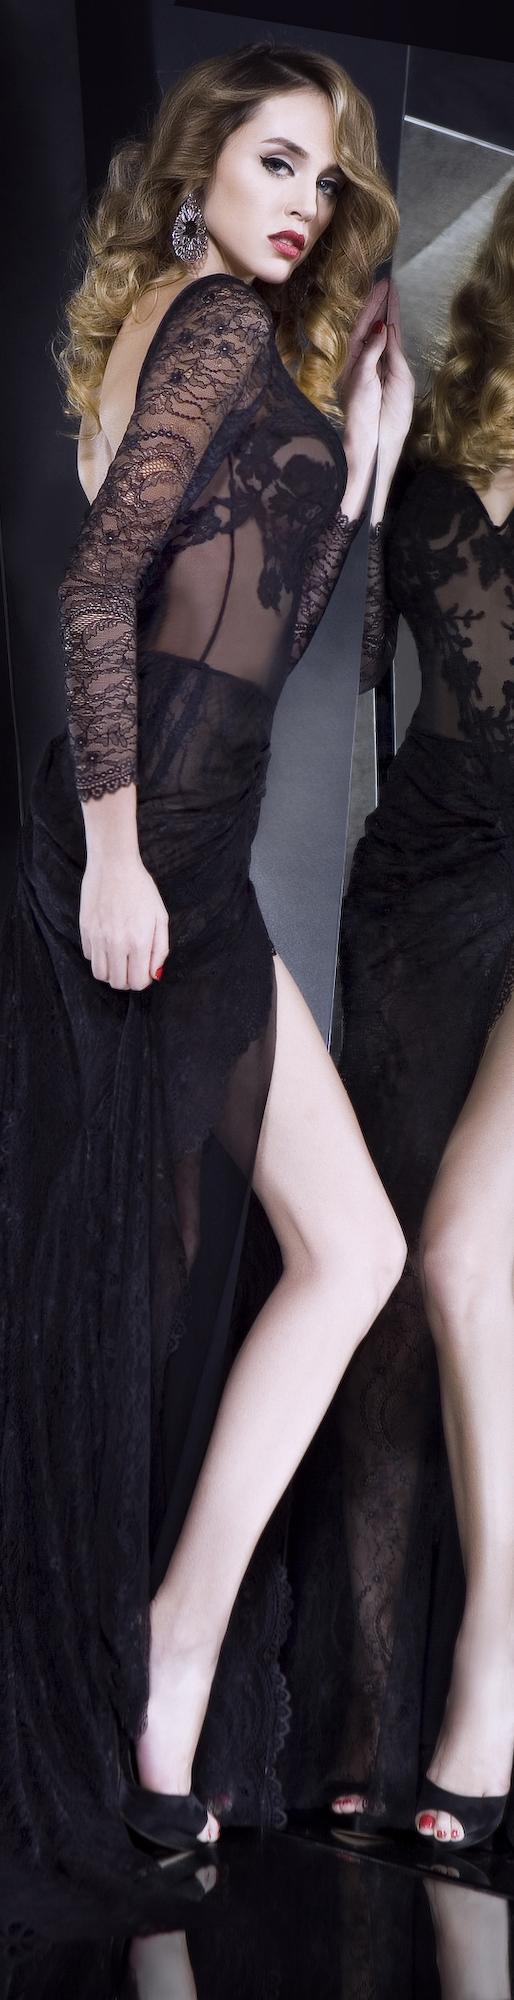 Rochie de seara gown #black #sexy #lace #elegant #dress